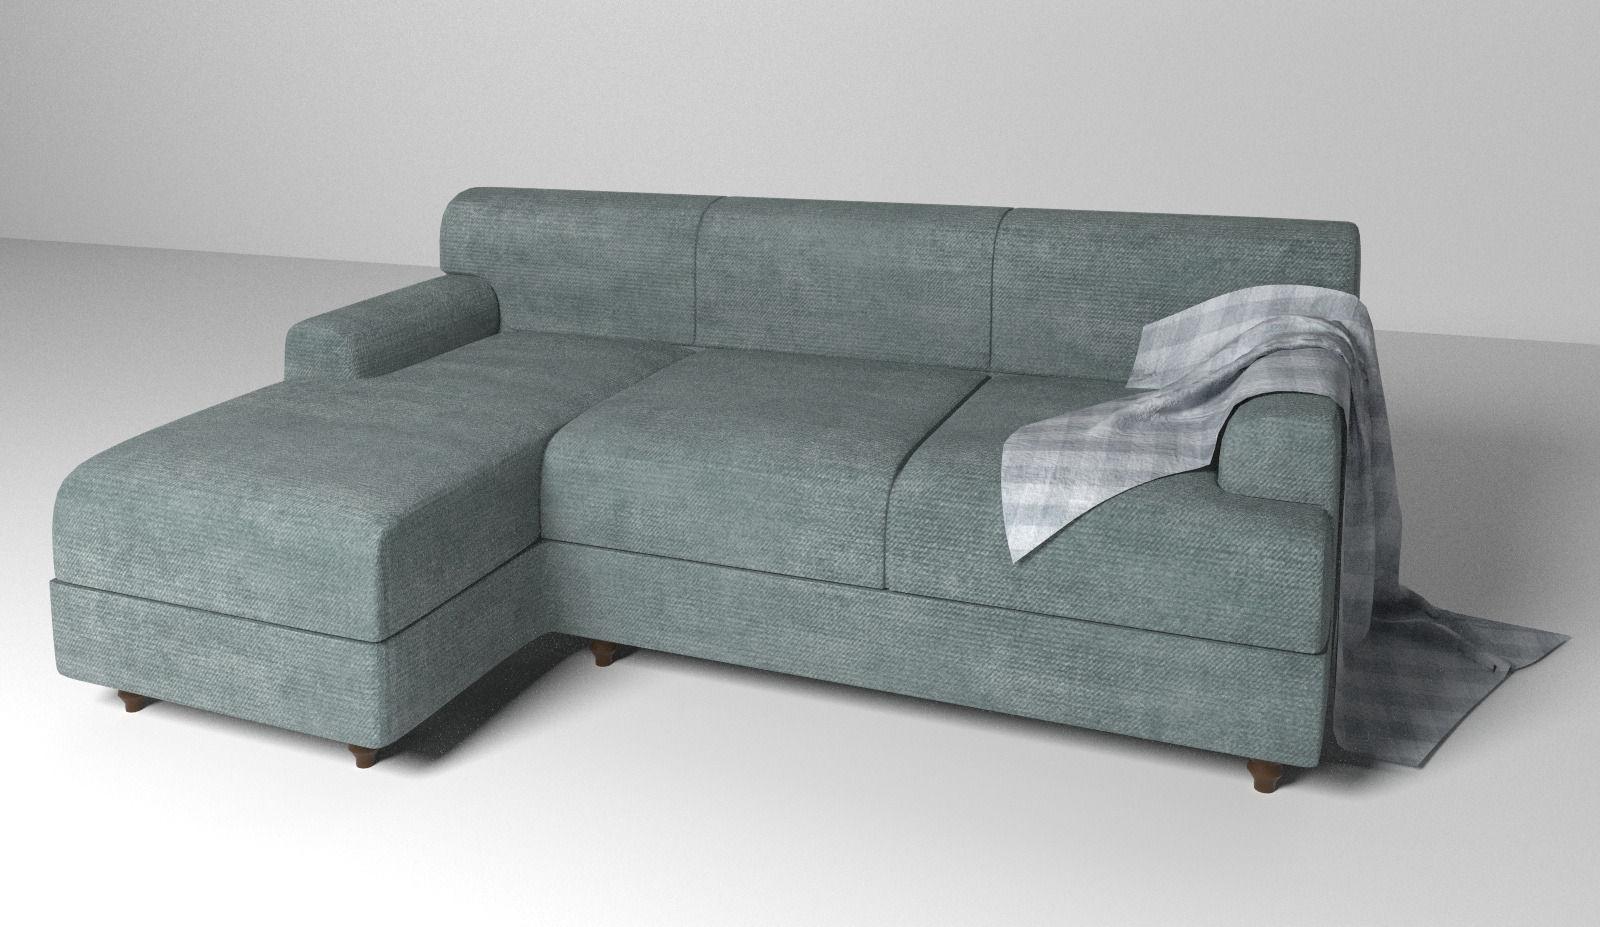 Velvet fabric sofa 3D Model MAX OBJ 3DS FBX CGTradercom : velvetfabricsofa3dmodel3dsfbxobj7b97cbe0 e471 46dc 8a1a c66f623db36c from www.cgtrader.com size 1600 x 927 jpeg 169kB